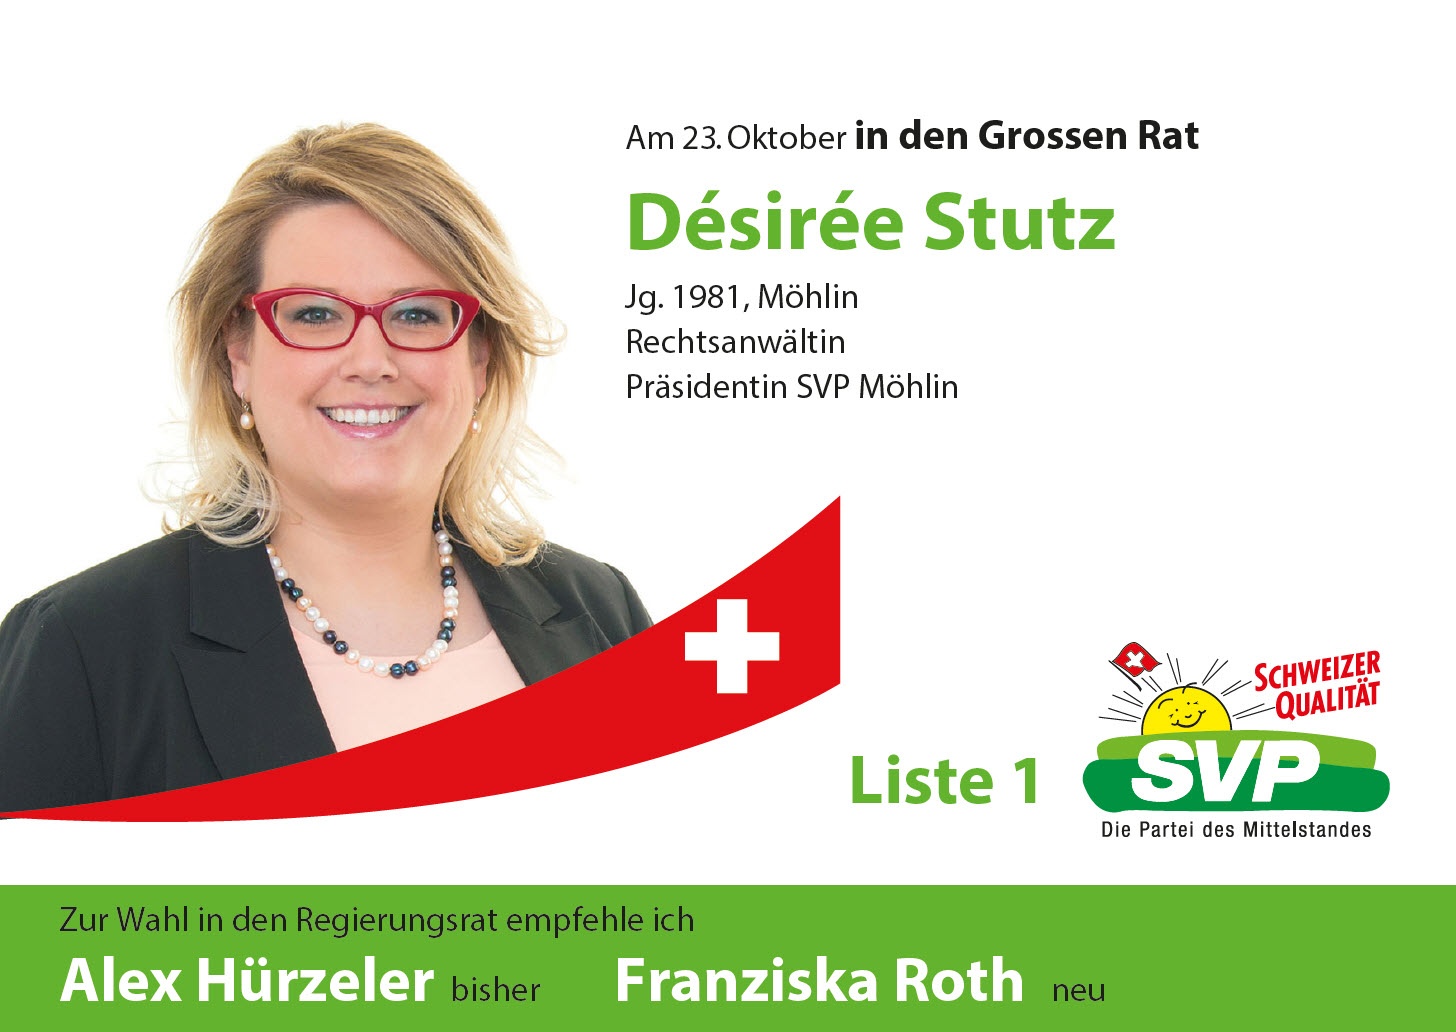 WerbekarteDesireeStutzListe1